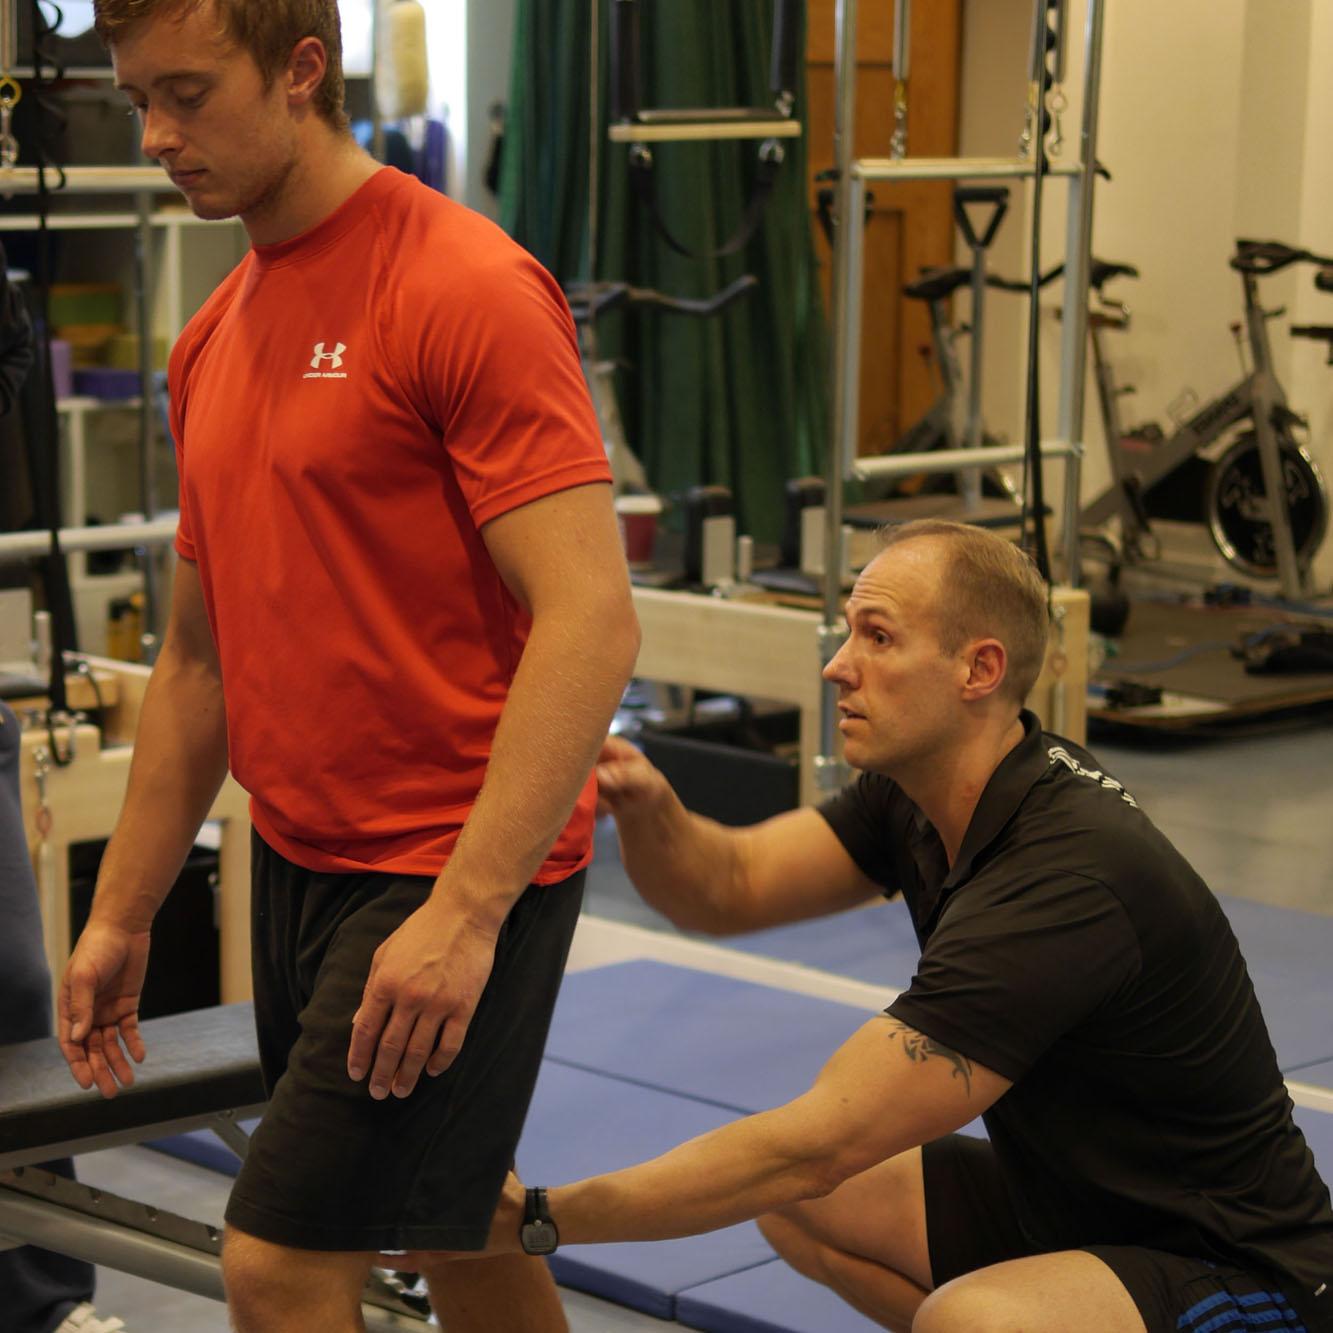 Kurs - Thirst 4 Function – Zasady funkcjonalnej oceny i terapii ruchu.